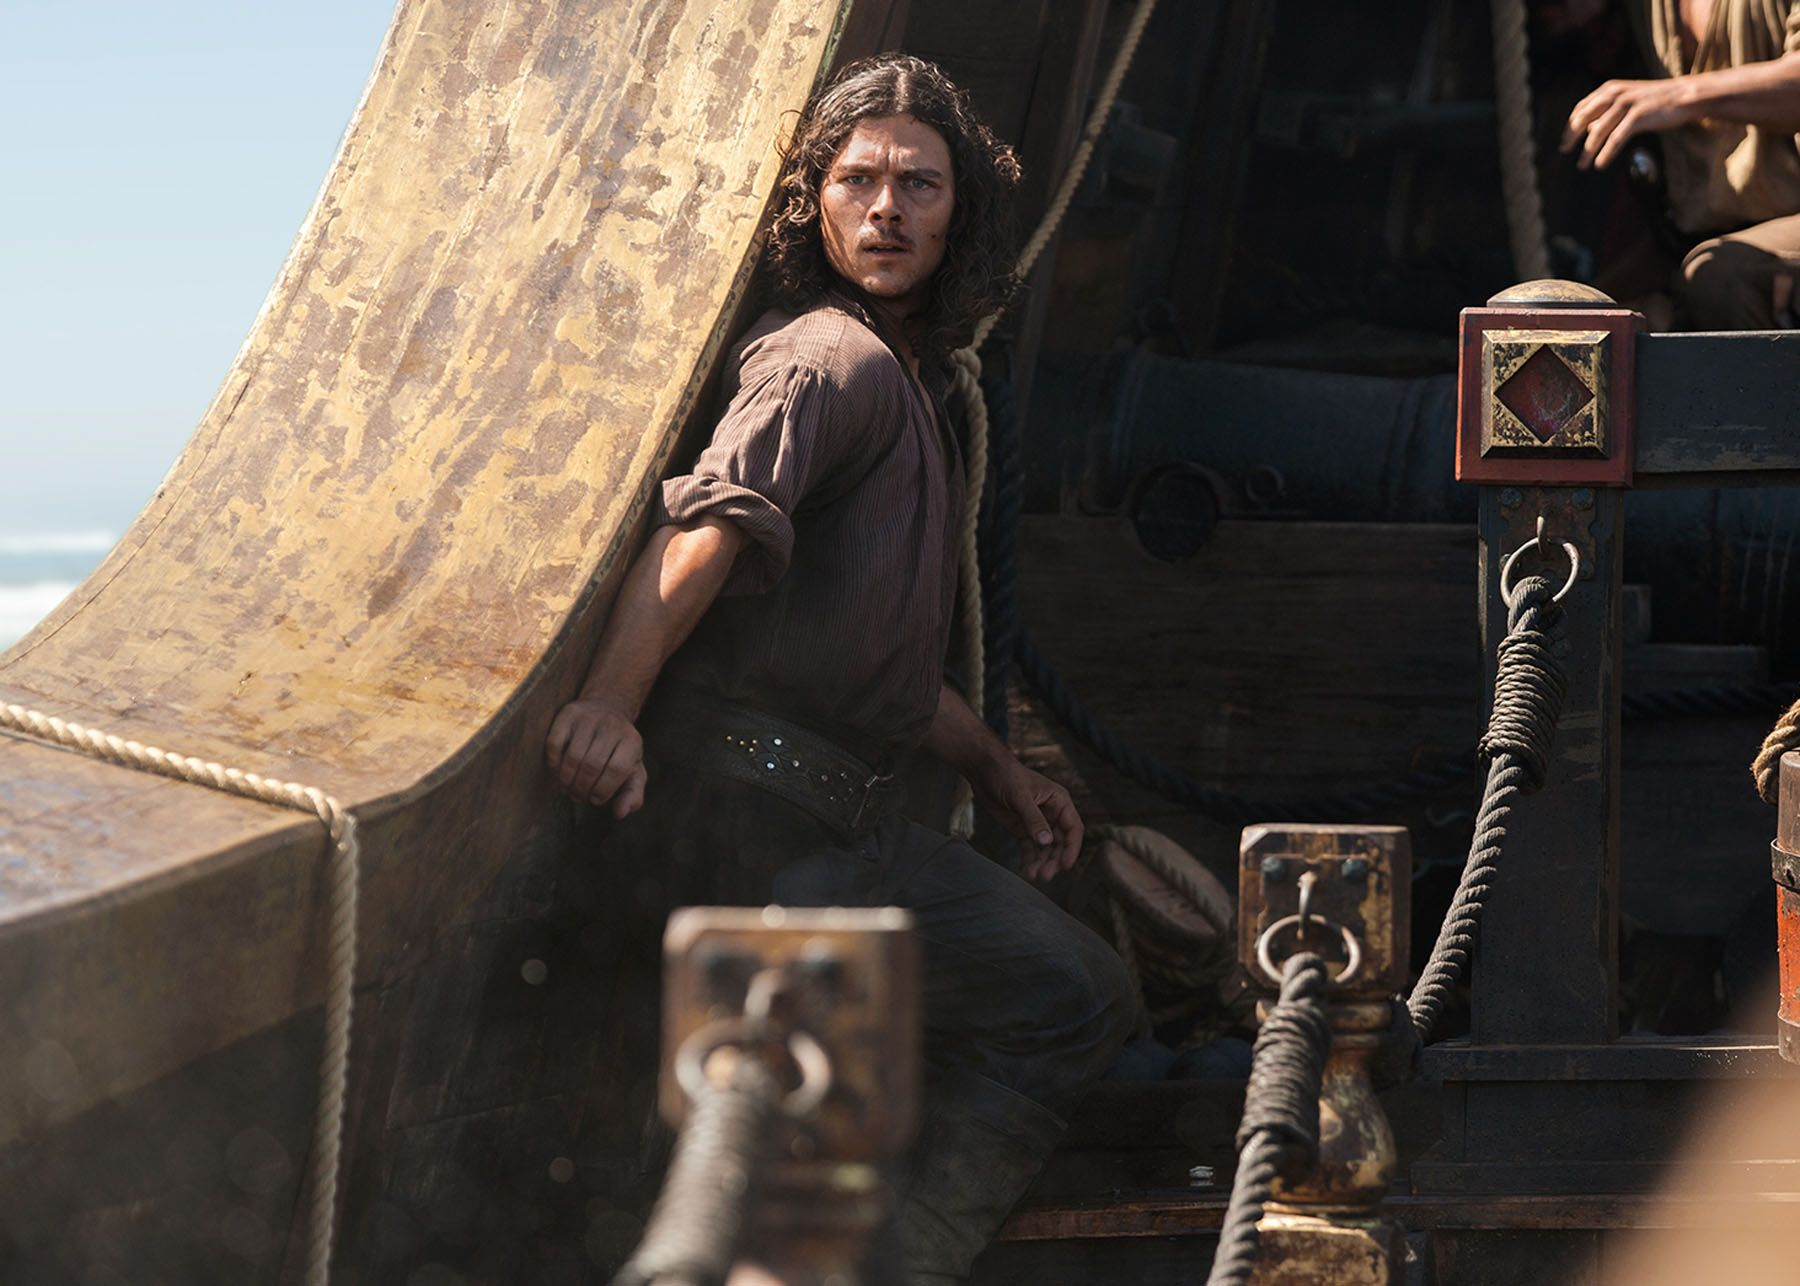 Black Sails'- star Ray Stevenson didn'-t choose acting